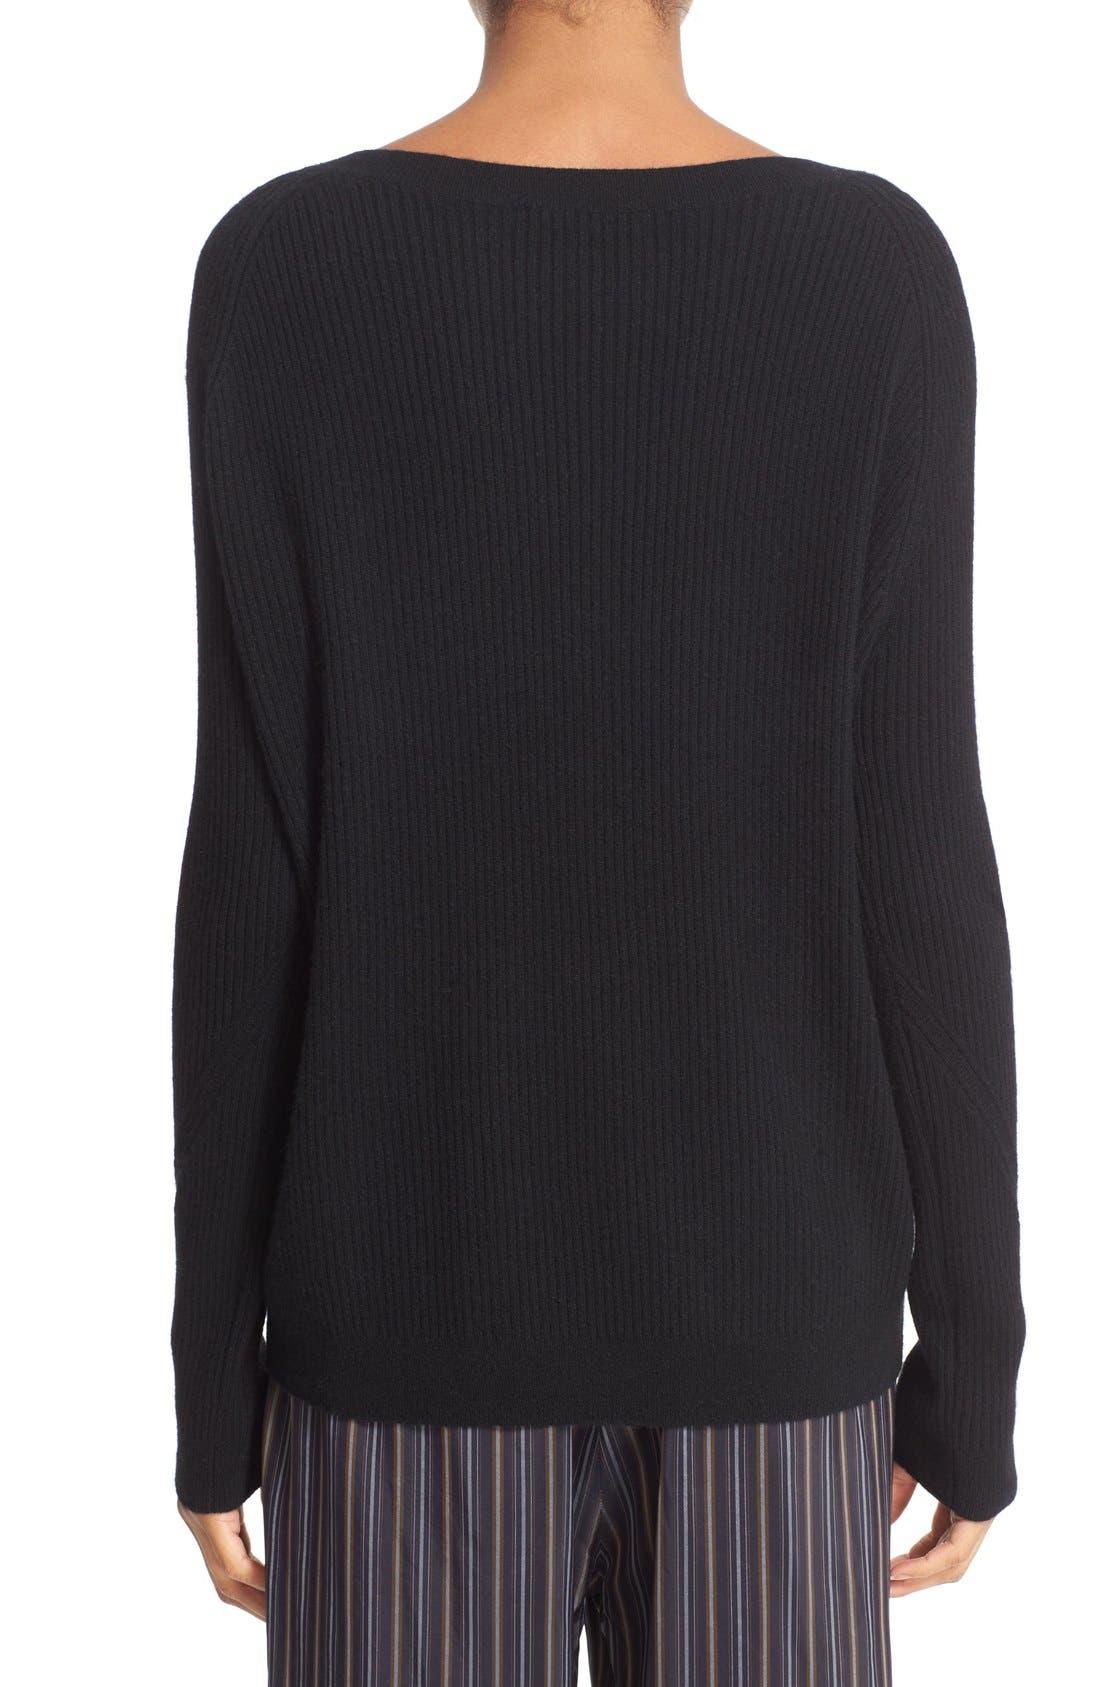 VINCE, Rib Knit Raglan Sleeve Cashmere Sweater, Alternate thumbnail 2, color, 001